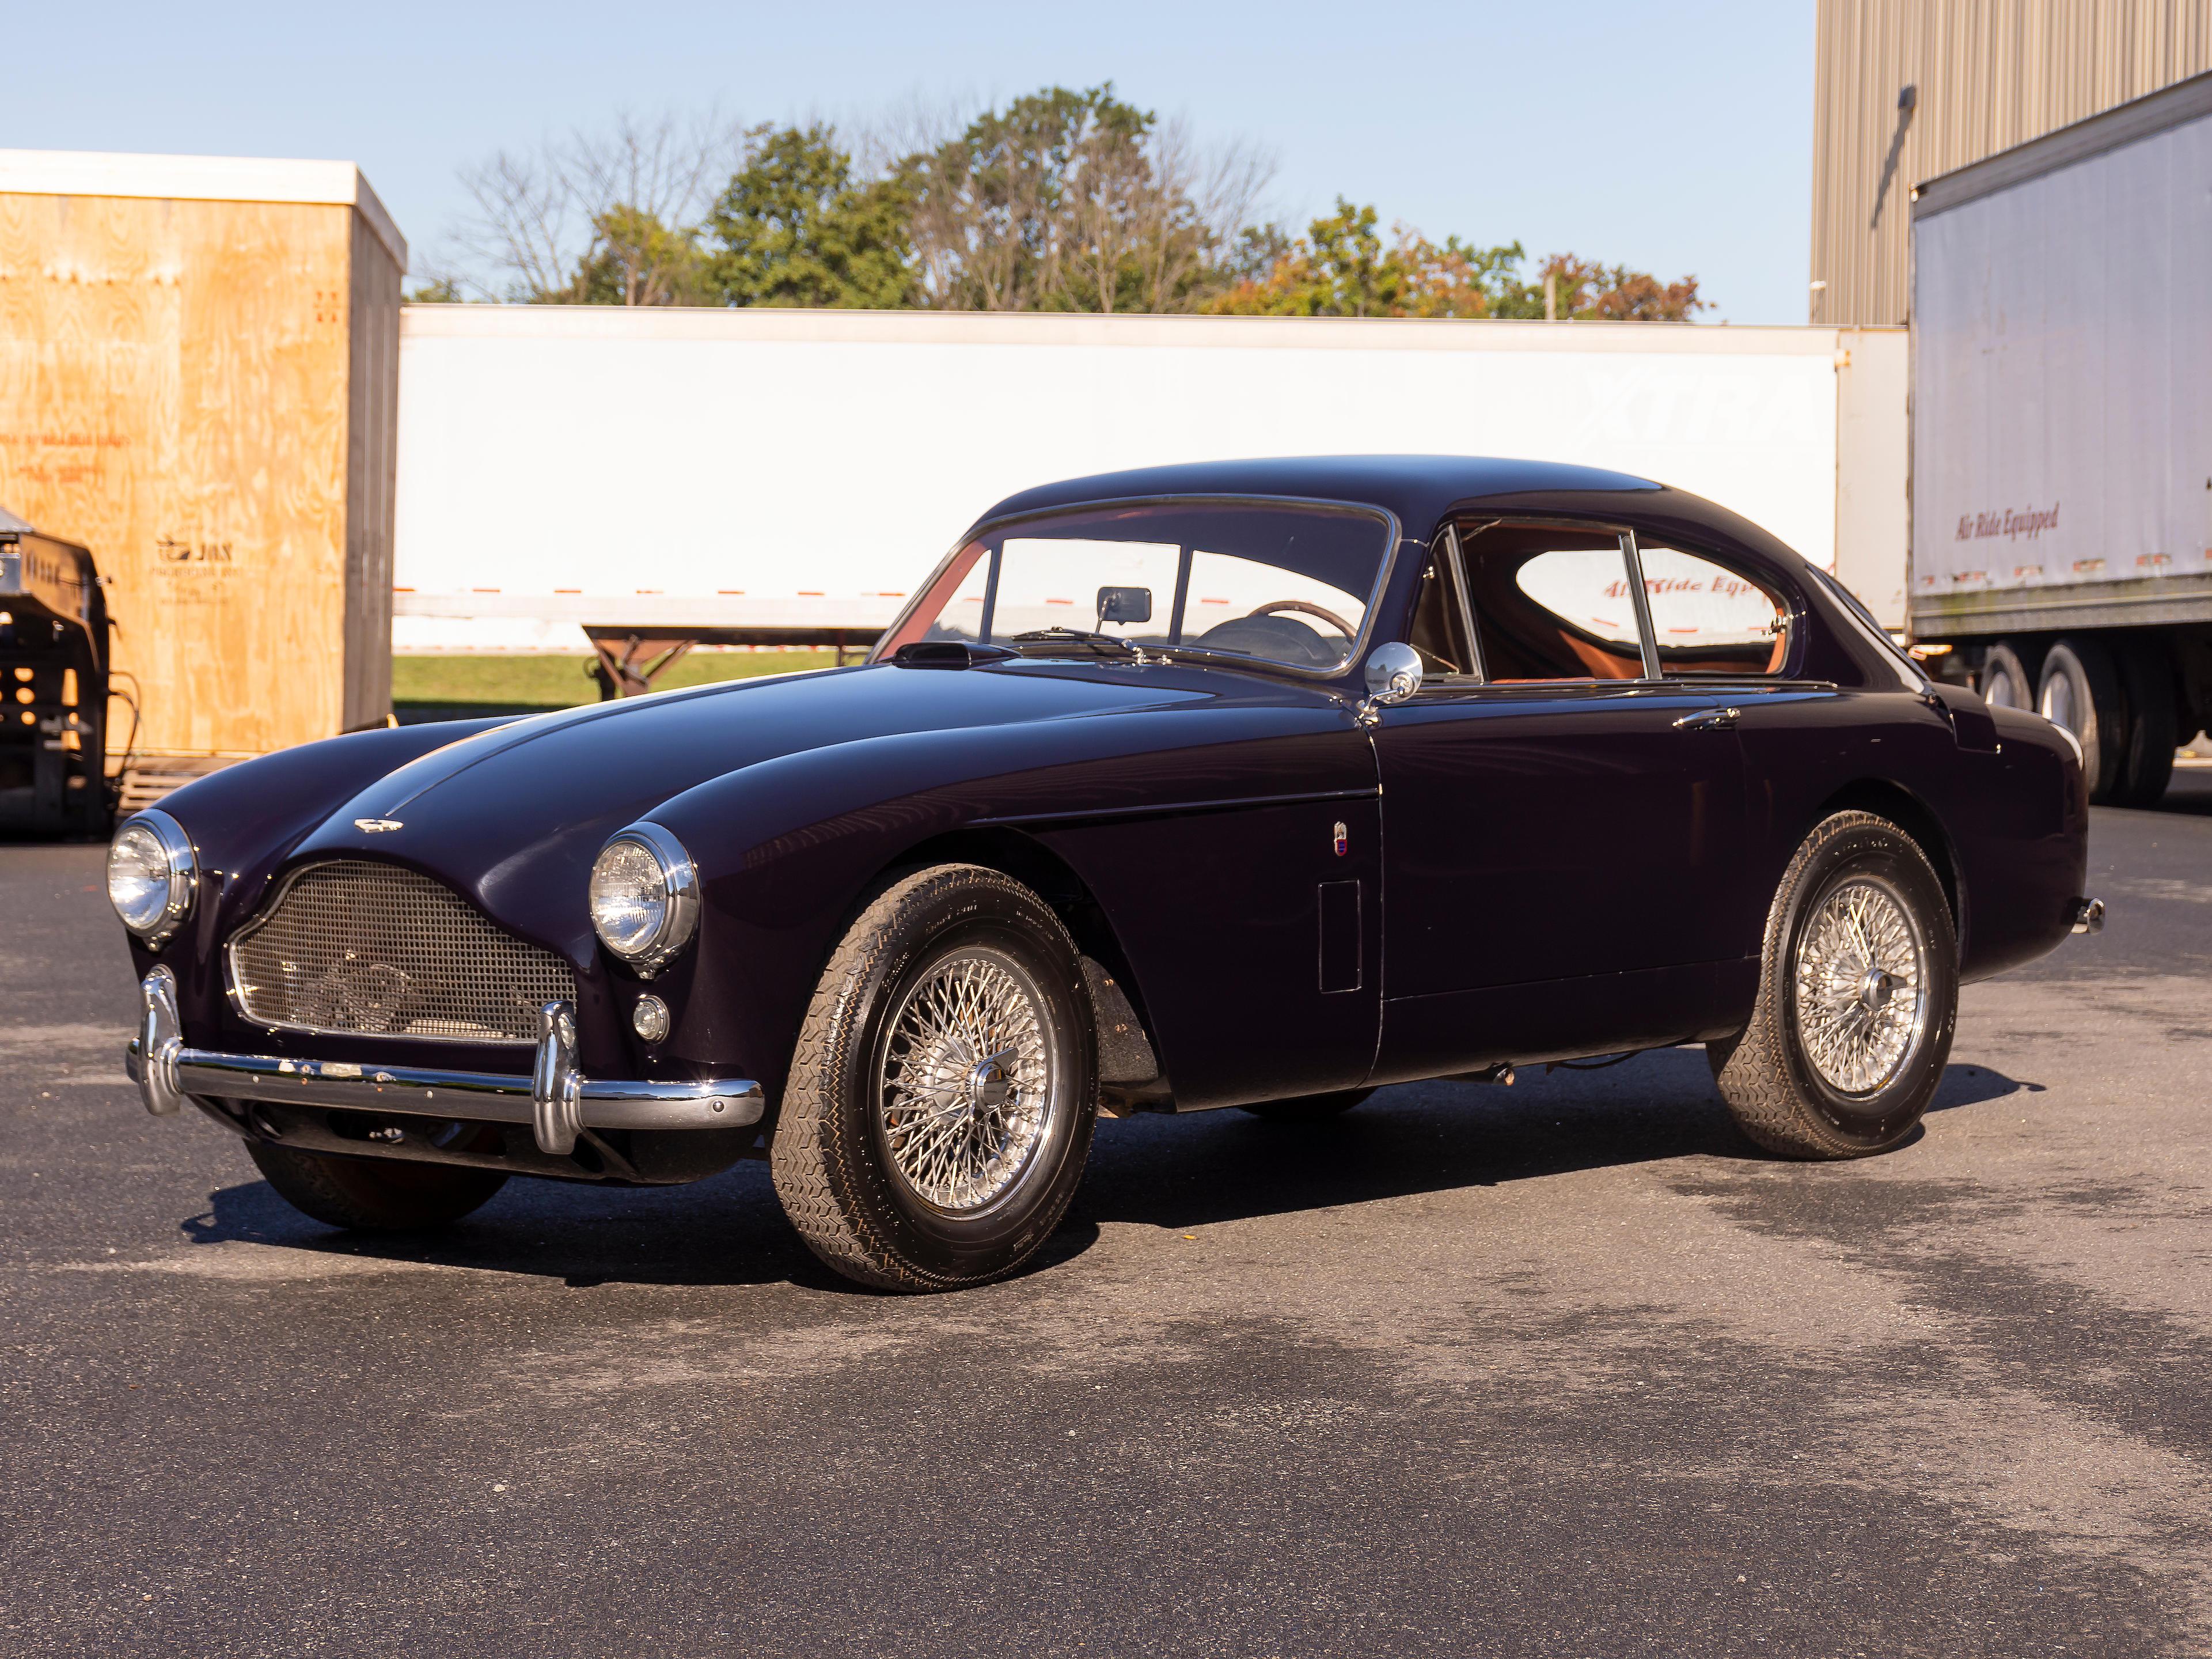 1960 Aston Martin DB2/4 MkIII Saloon  Coachwork by Tickford Chassis no. AM300/3/1728 Engine no. DBA/1346